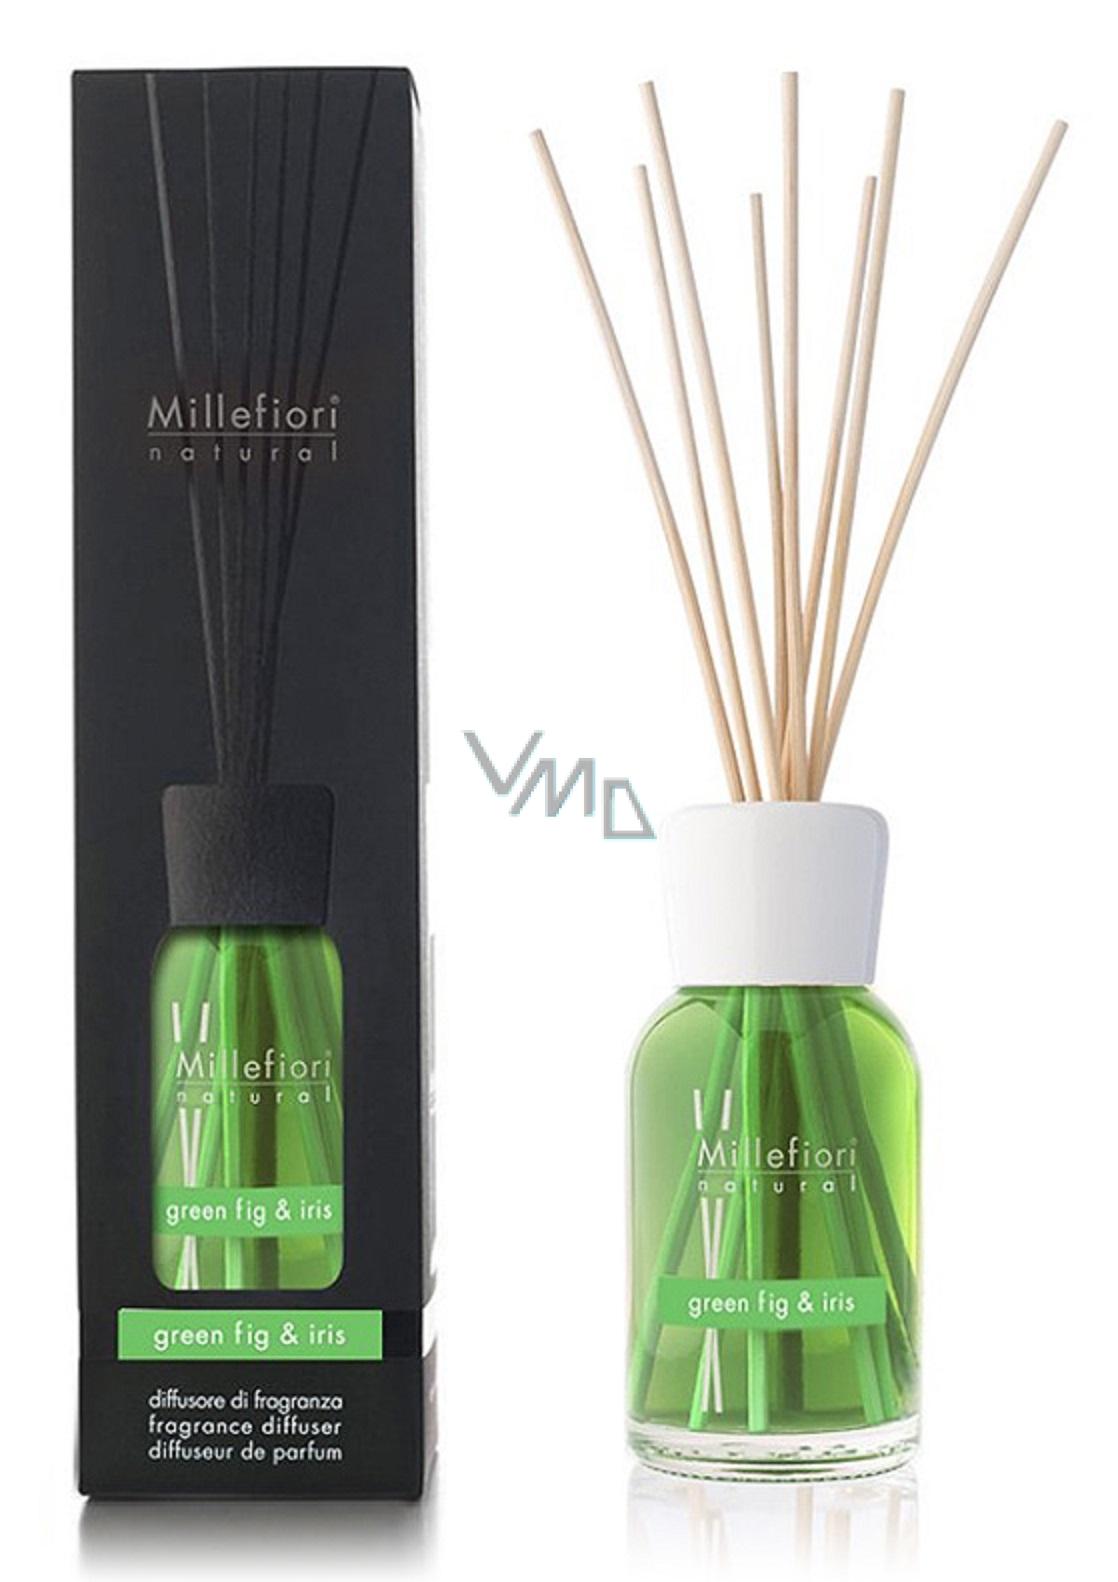 MF.Natural diffuser 500ml / Green Fig & Iris 11/18